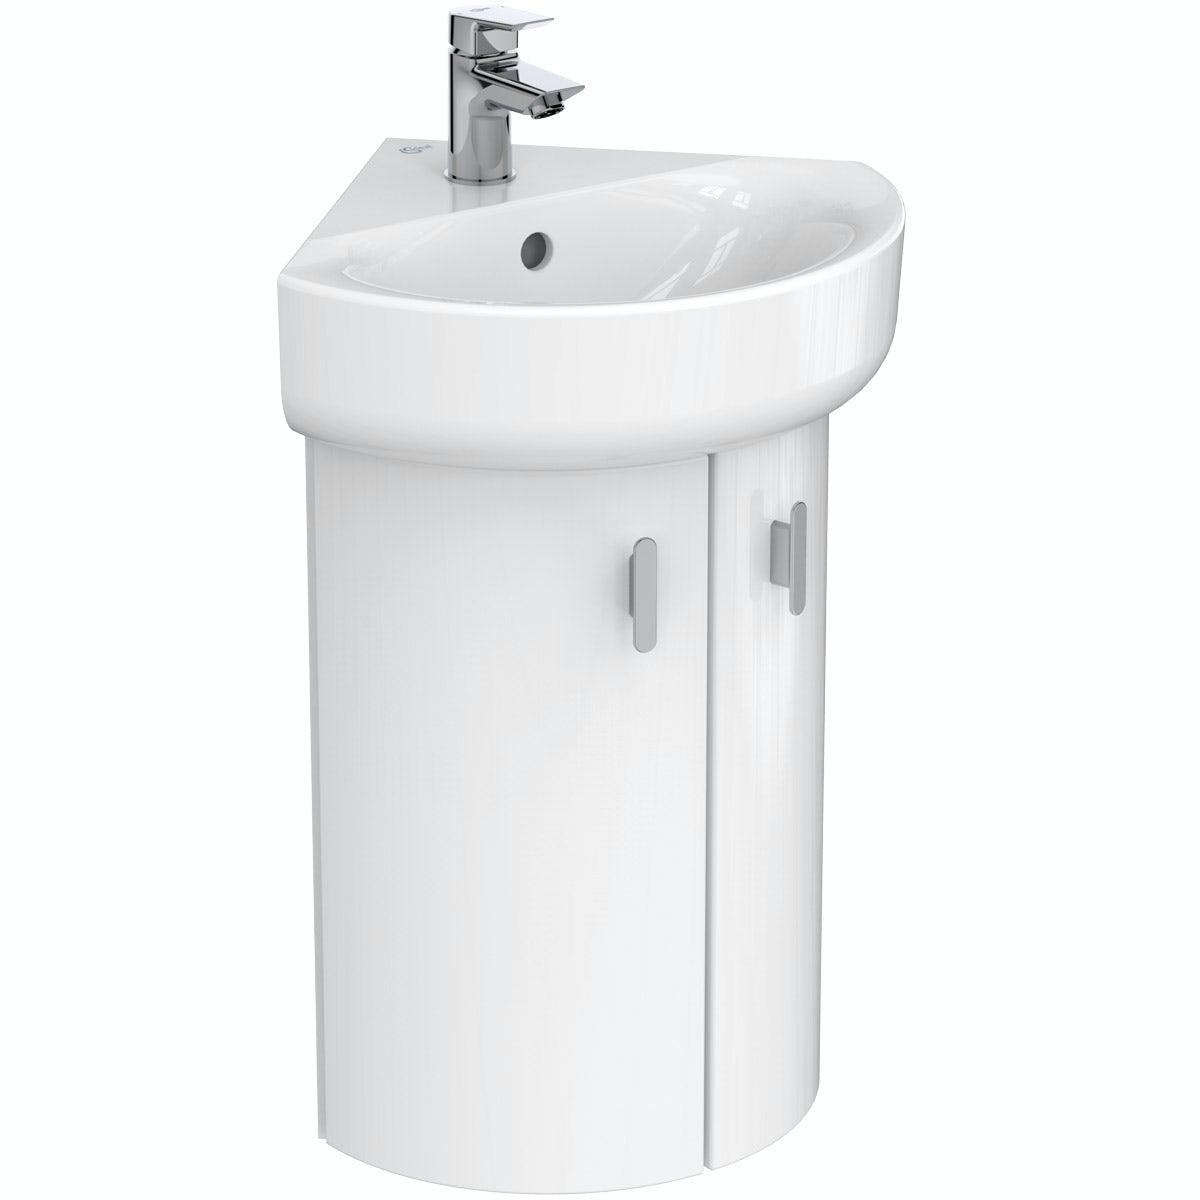 Ideal Standard Concept E White Wall